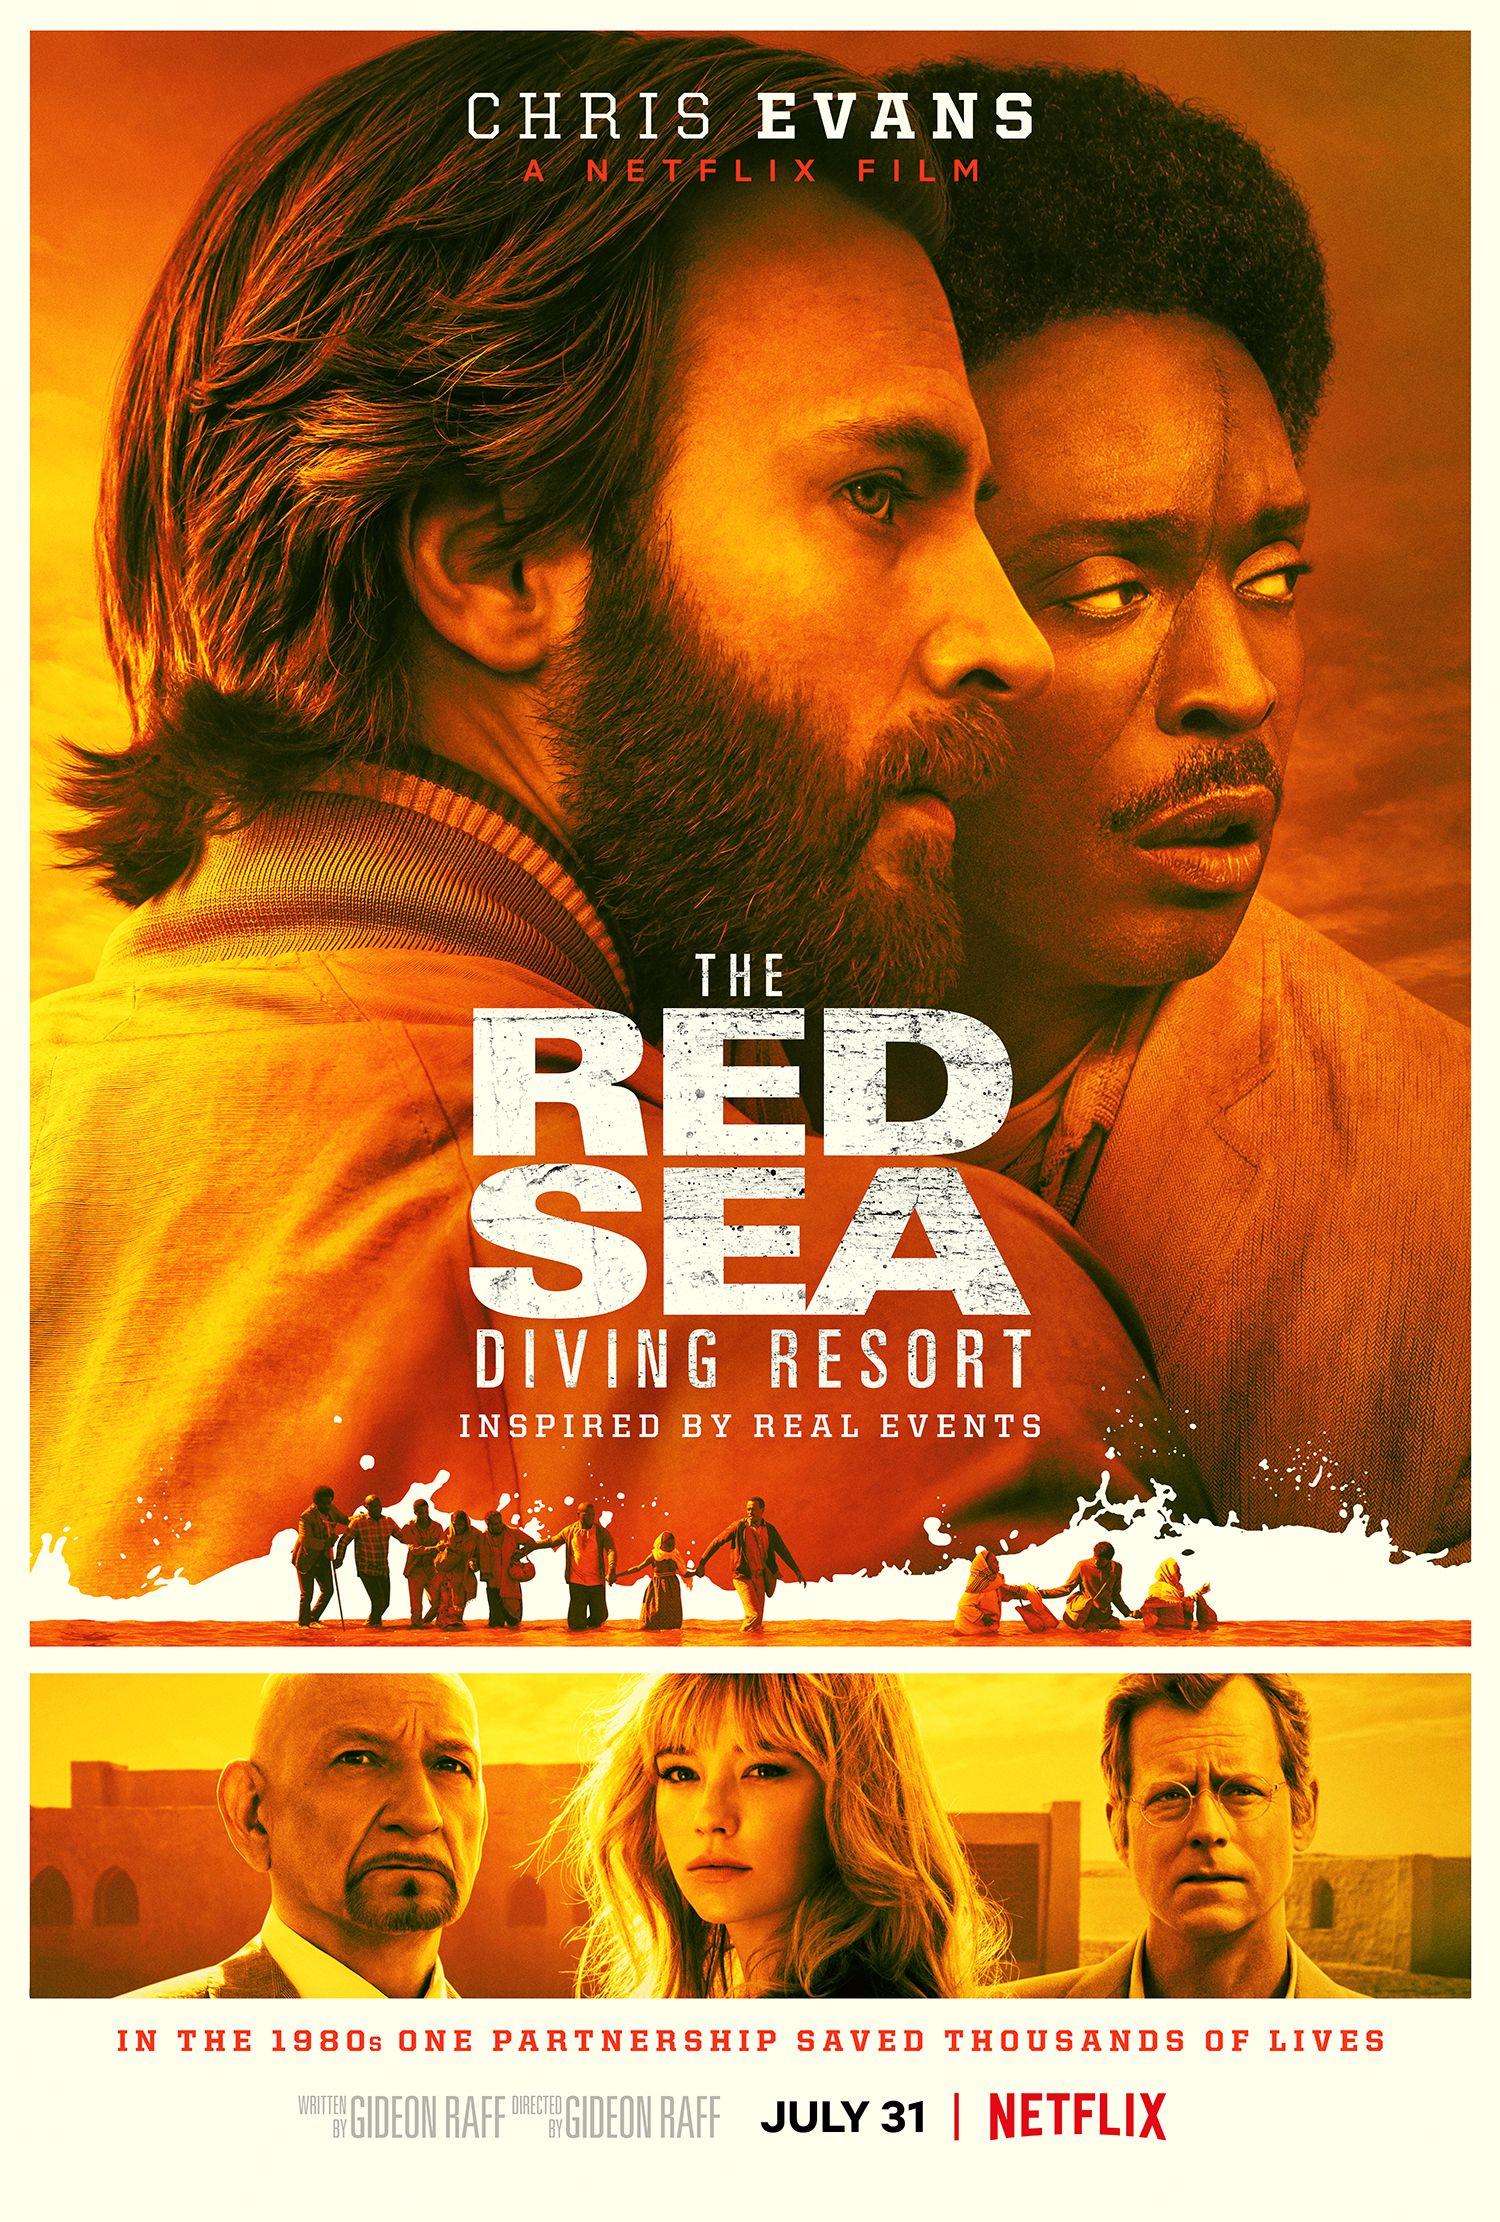 Chris Evans' Beard Shines in Red Sea Diving Resort Trailer for